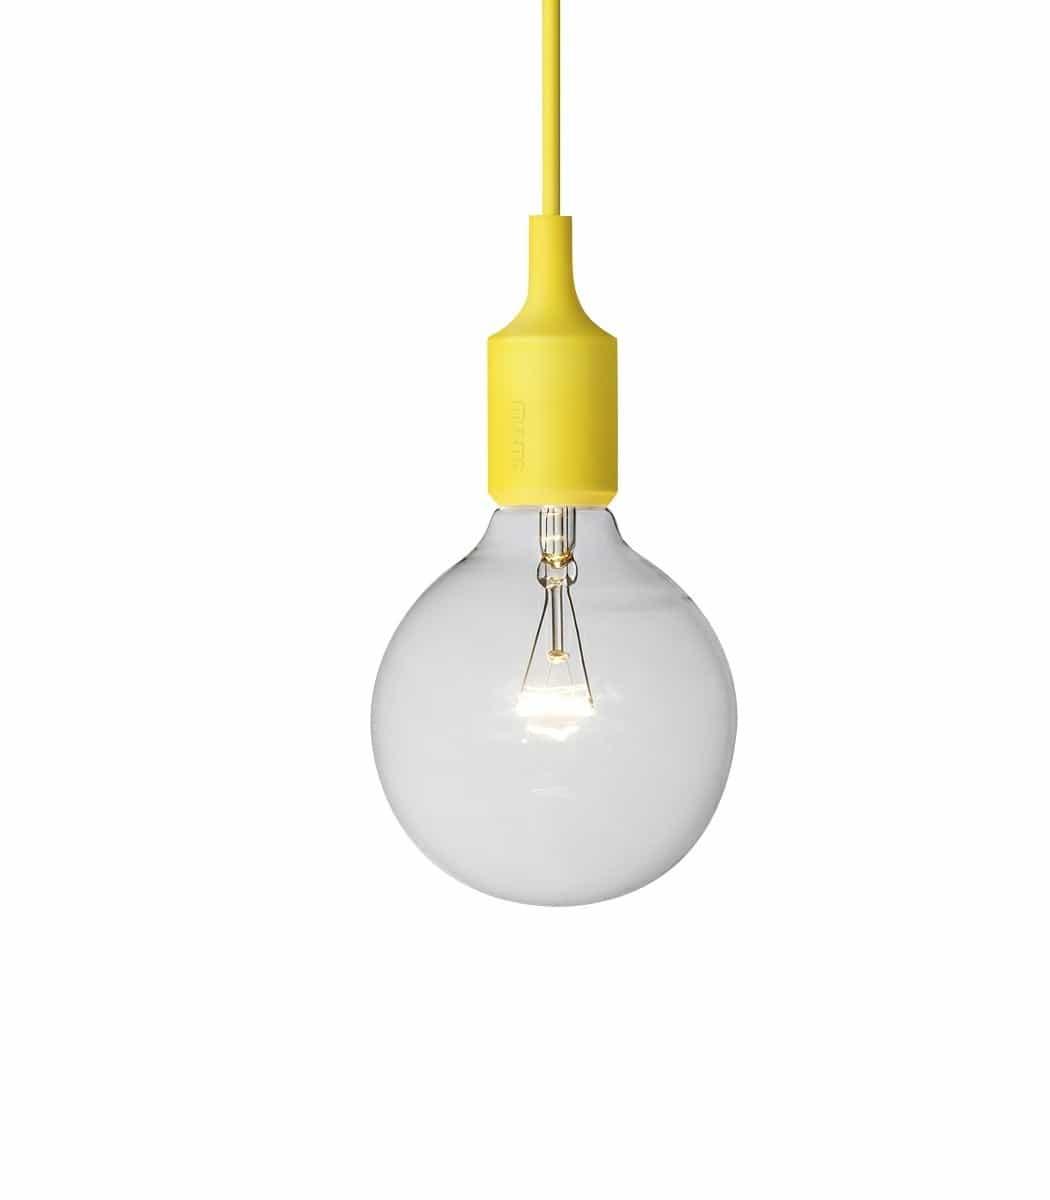 Ekstra Muuto - E27 lampe, gul - Interiørbutikken IP-54